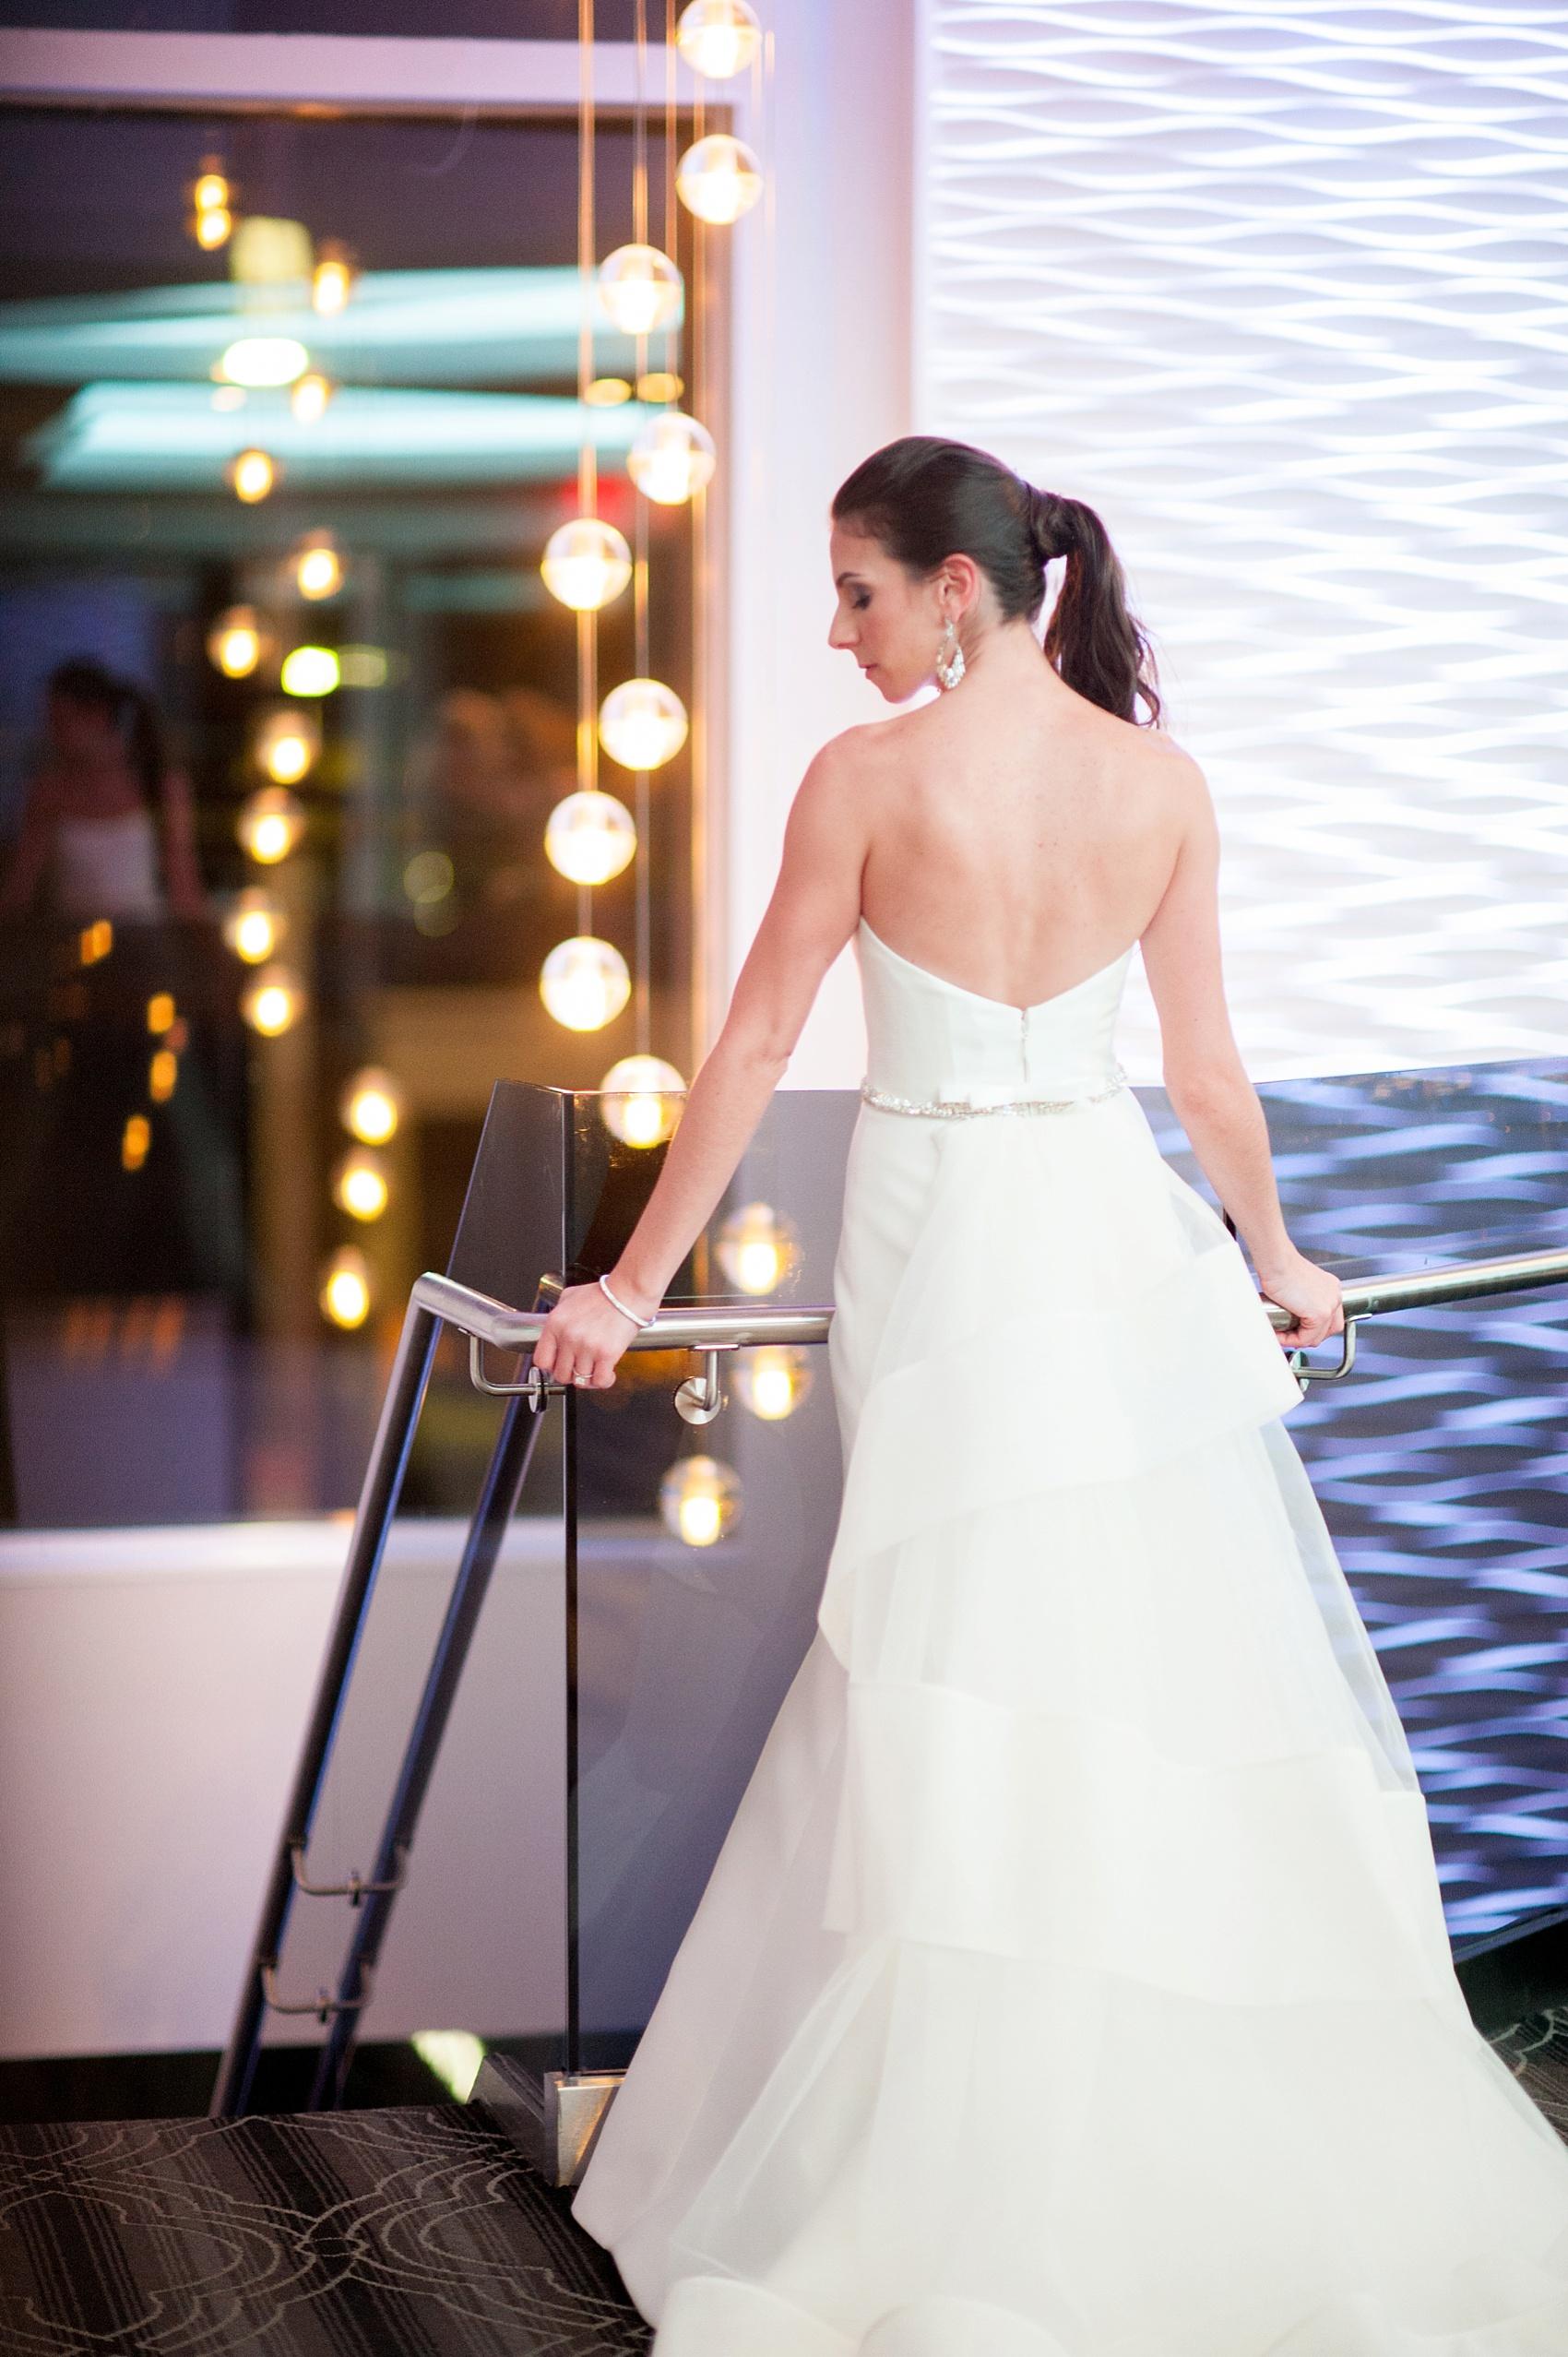 mikkelpaige-harbor_club_long_island-wedding_photographer-jen_dave_0077